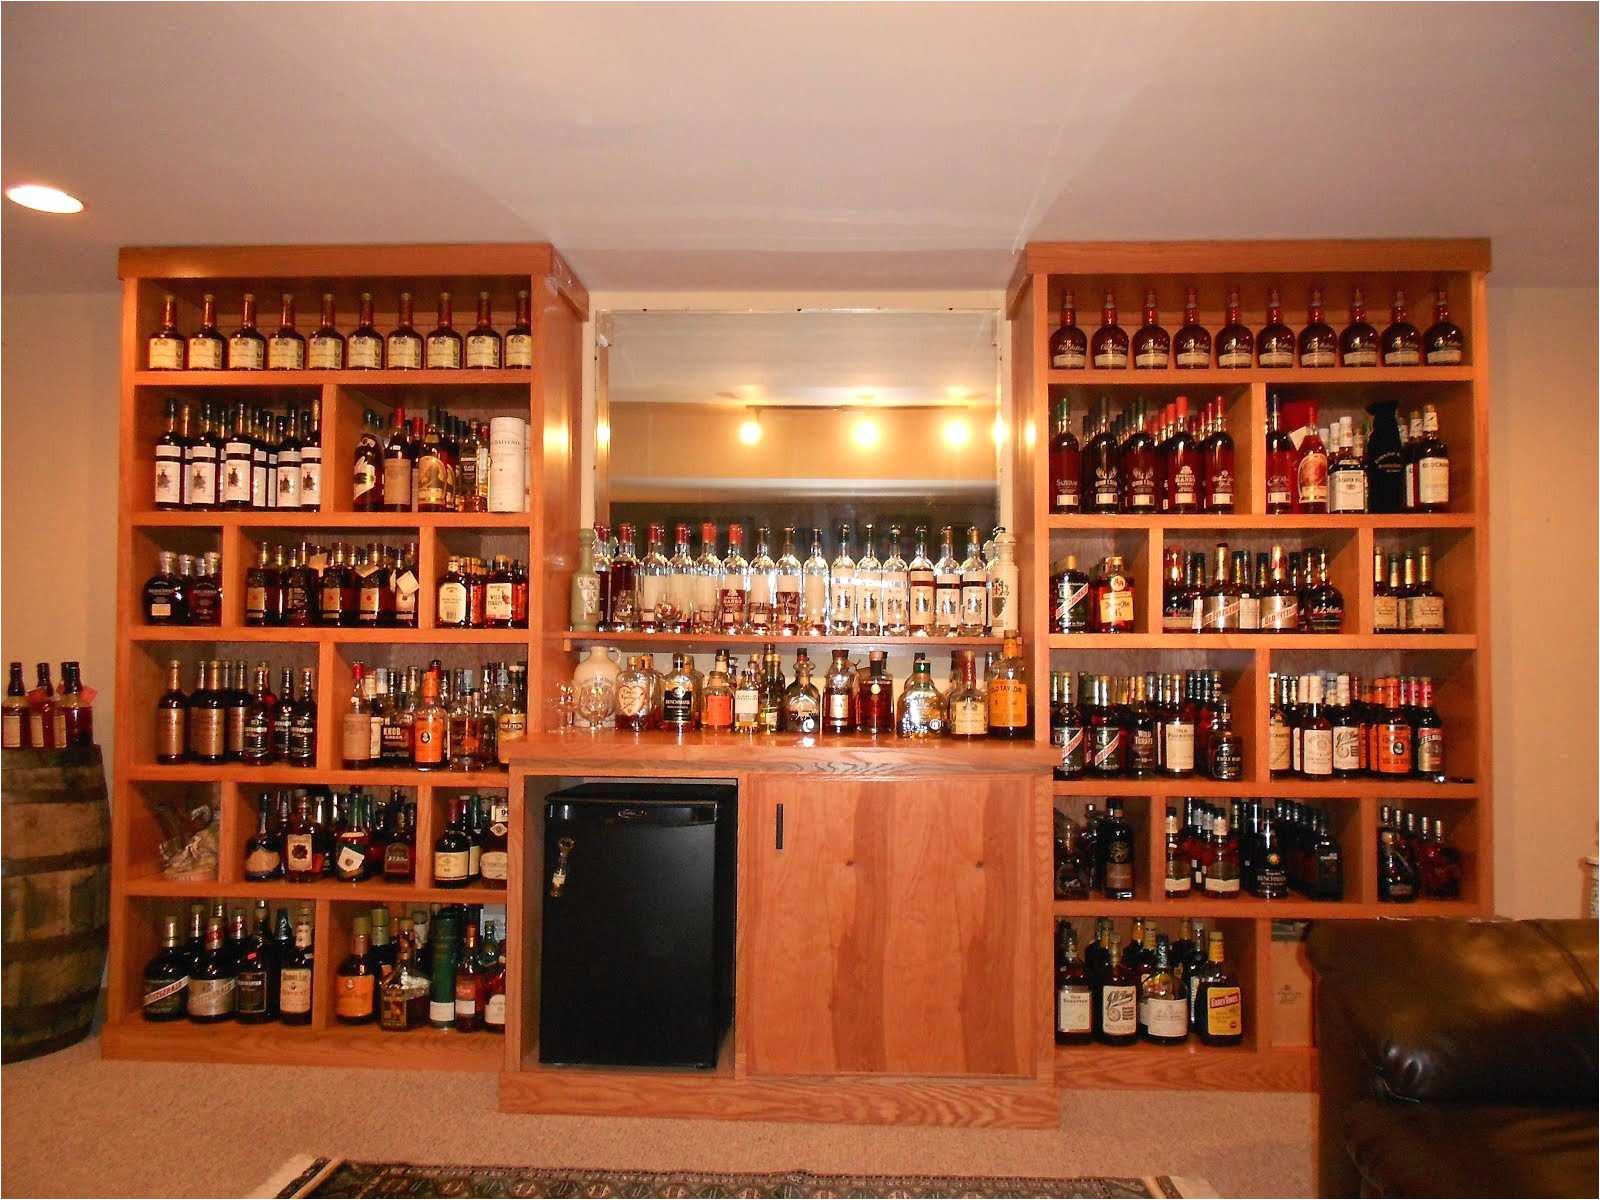 34 new stocks of mini bar cabinet ikea gezerproject org for ikea rh gezerproject org locking liquor cabinet ikea wine bar and cabinet designs